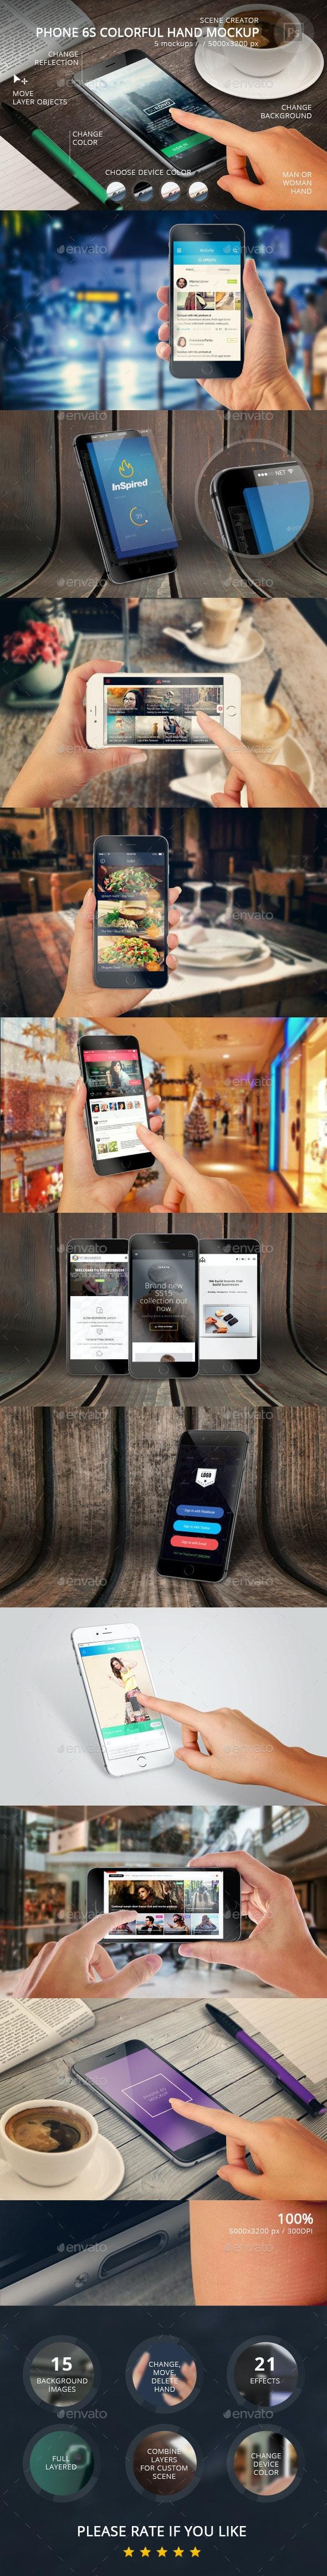 Phone 6S Colorful Hand Mockup - Mobile Displays